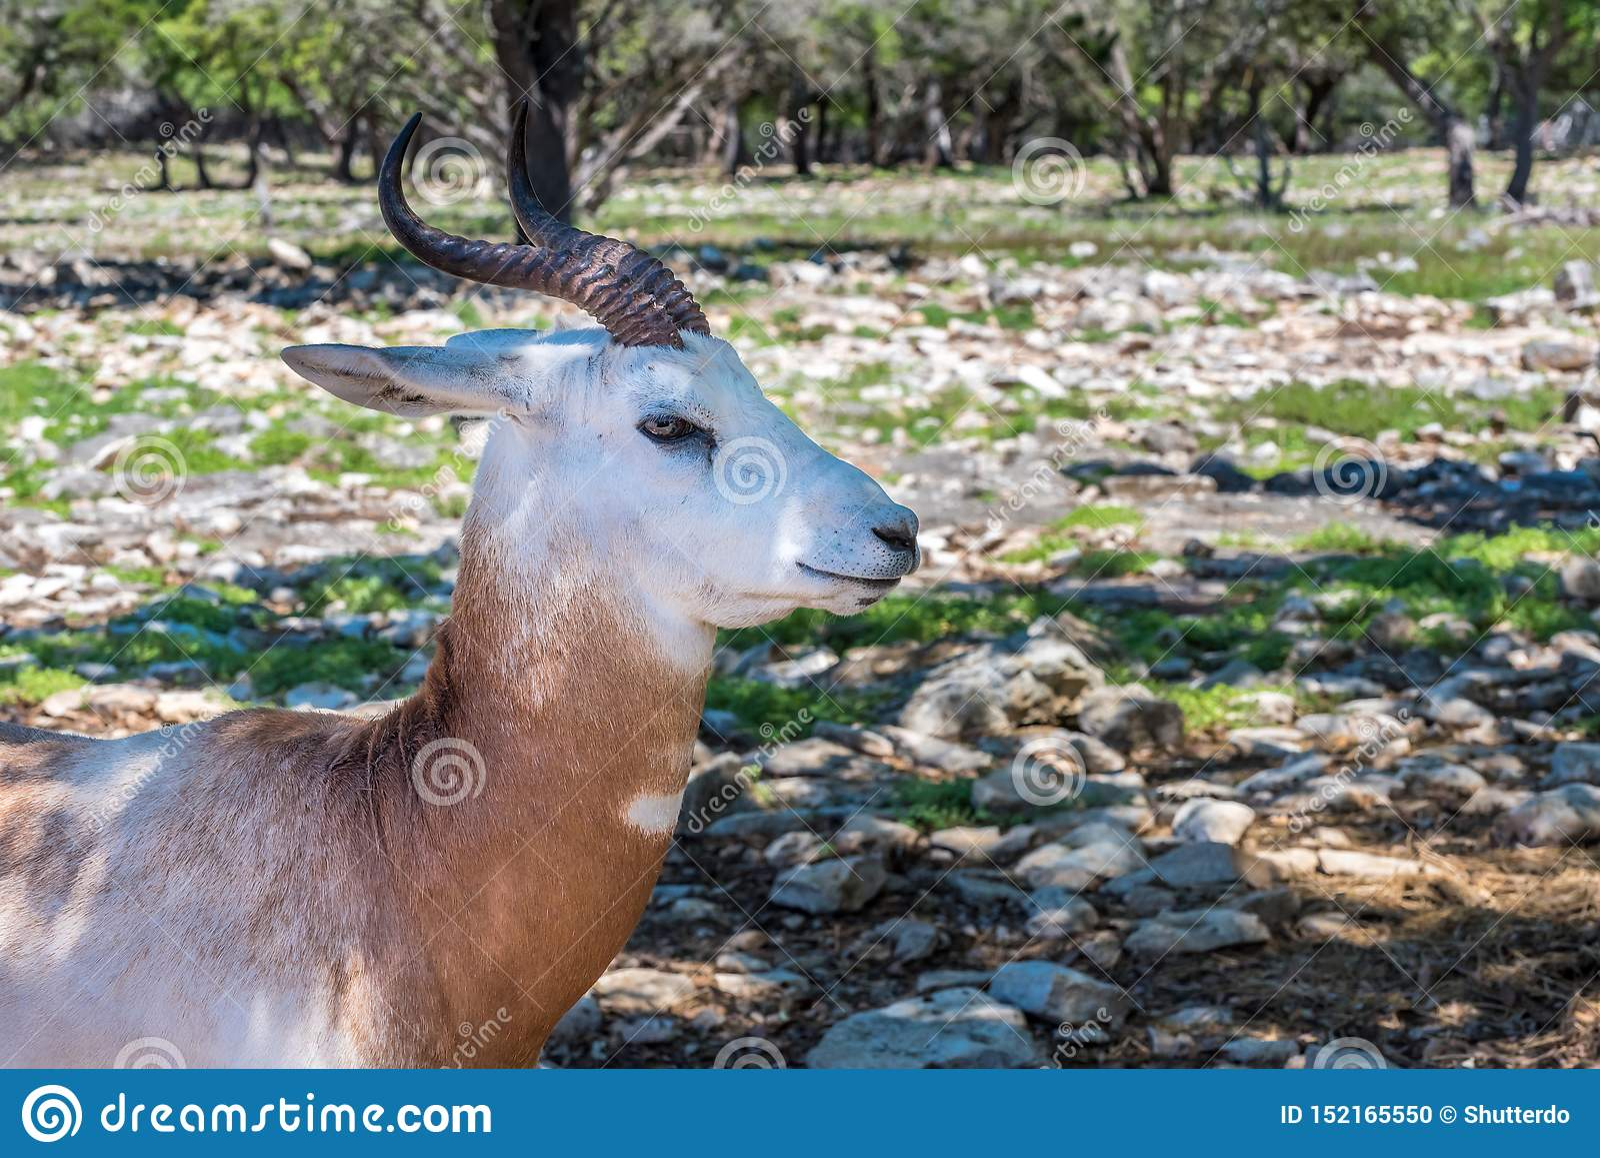 Closeup of an impala antelope head and neck